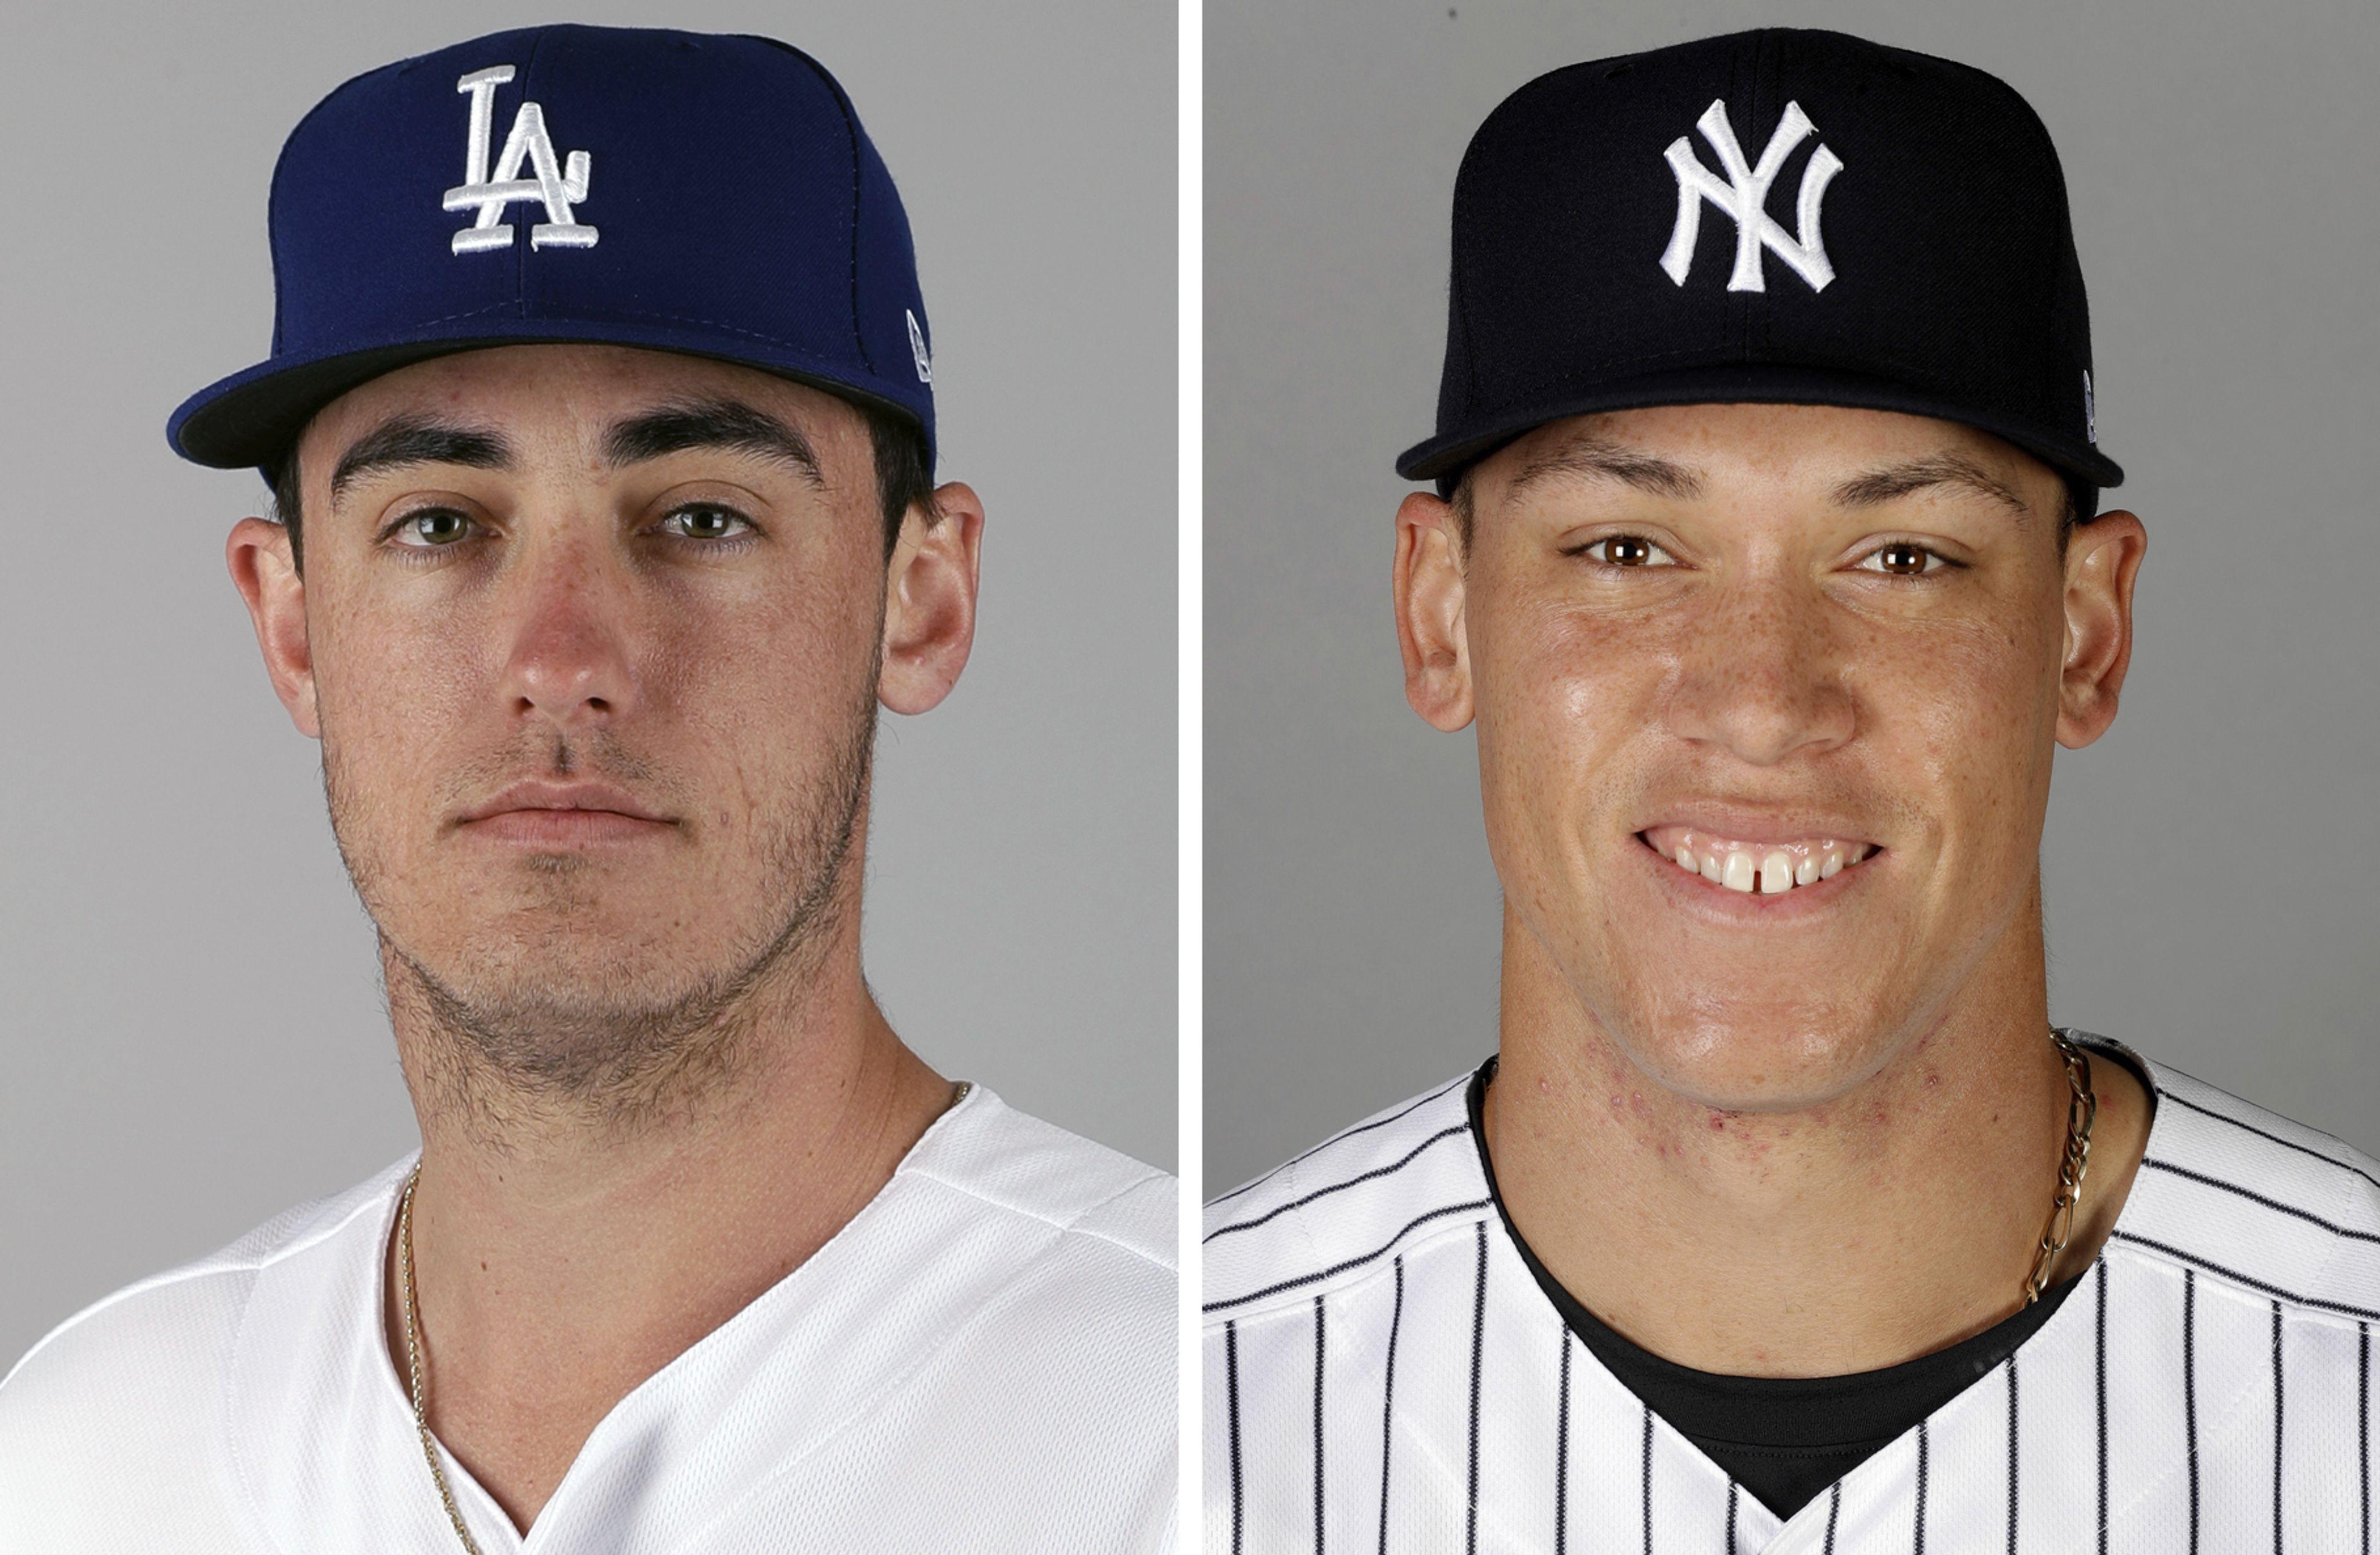 Rookies_of_the_year_baseball_19575.jpg-c4d89_s4096x2677